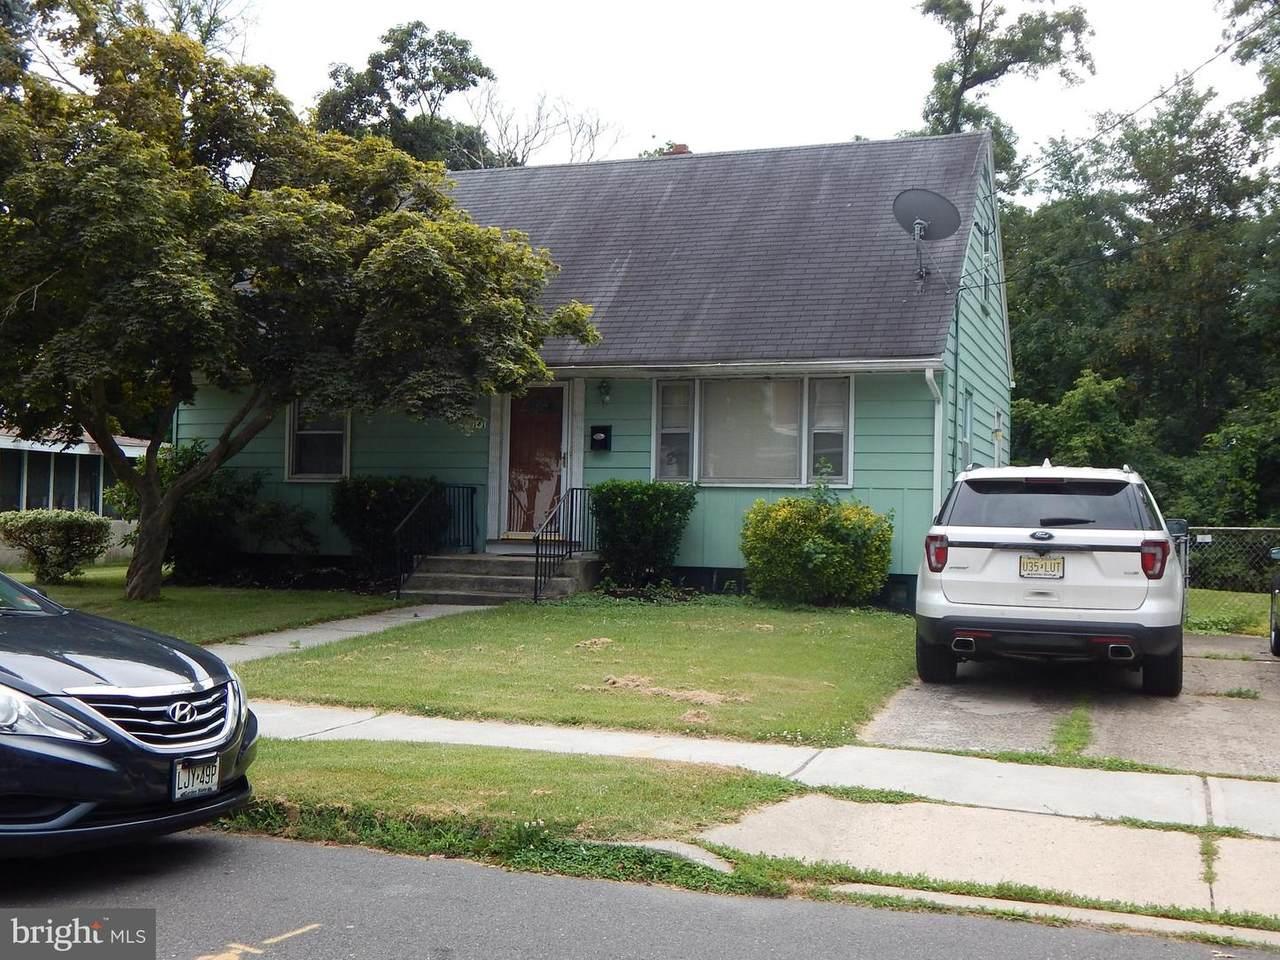 141 Mcclellan Ave - Photo 1